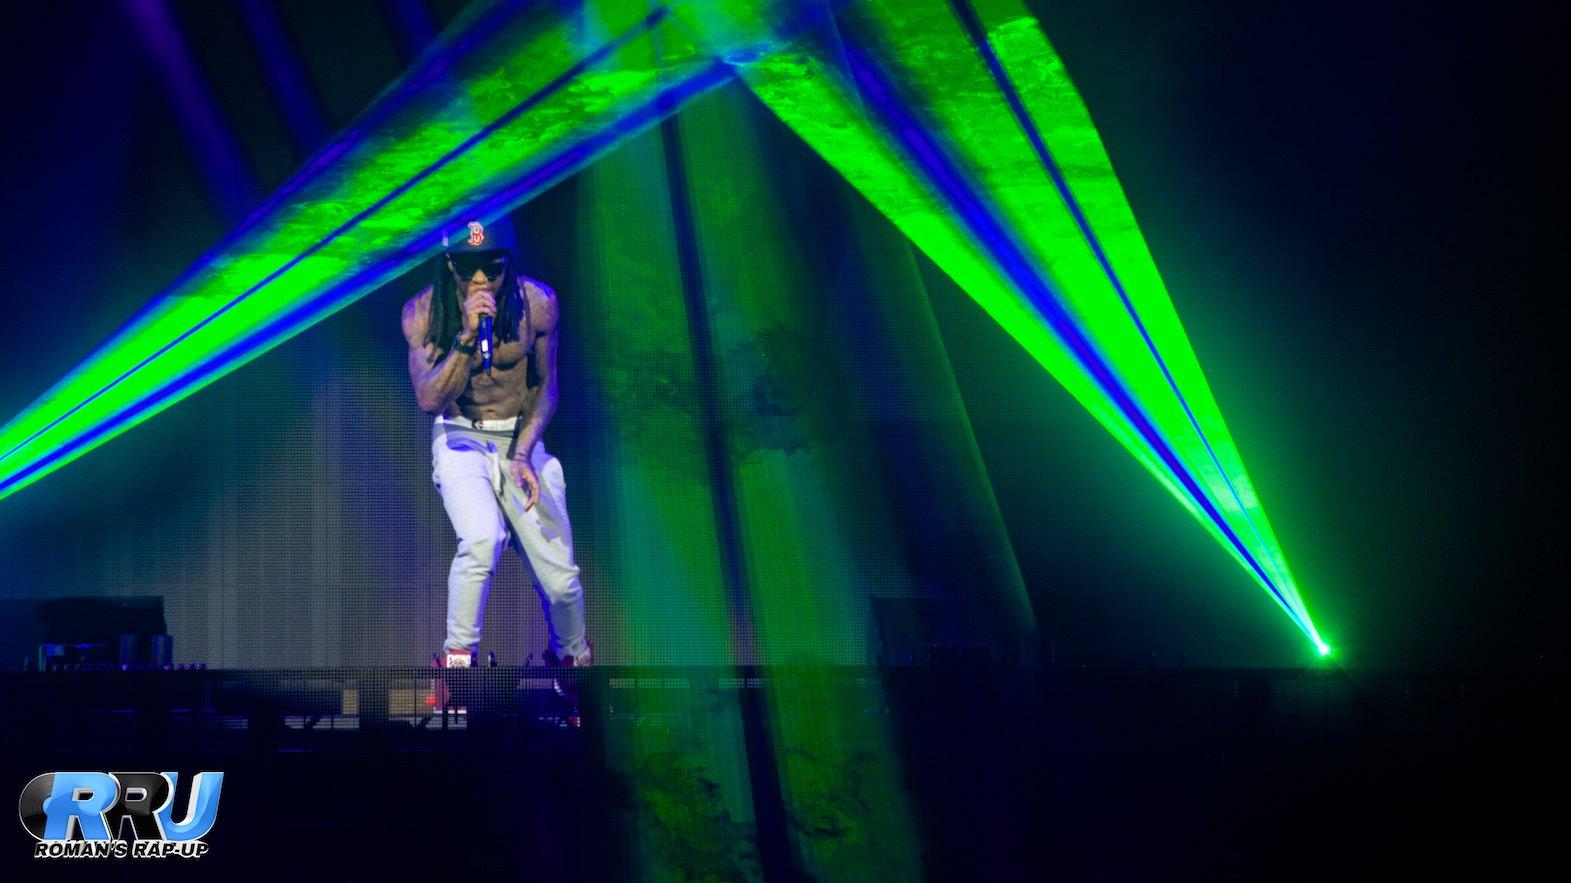 Drake Vs. Lil Wayne 21.jpg